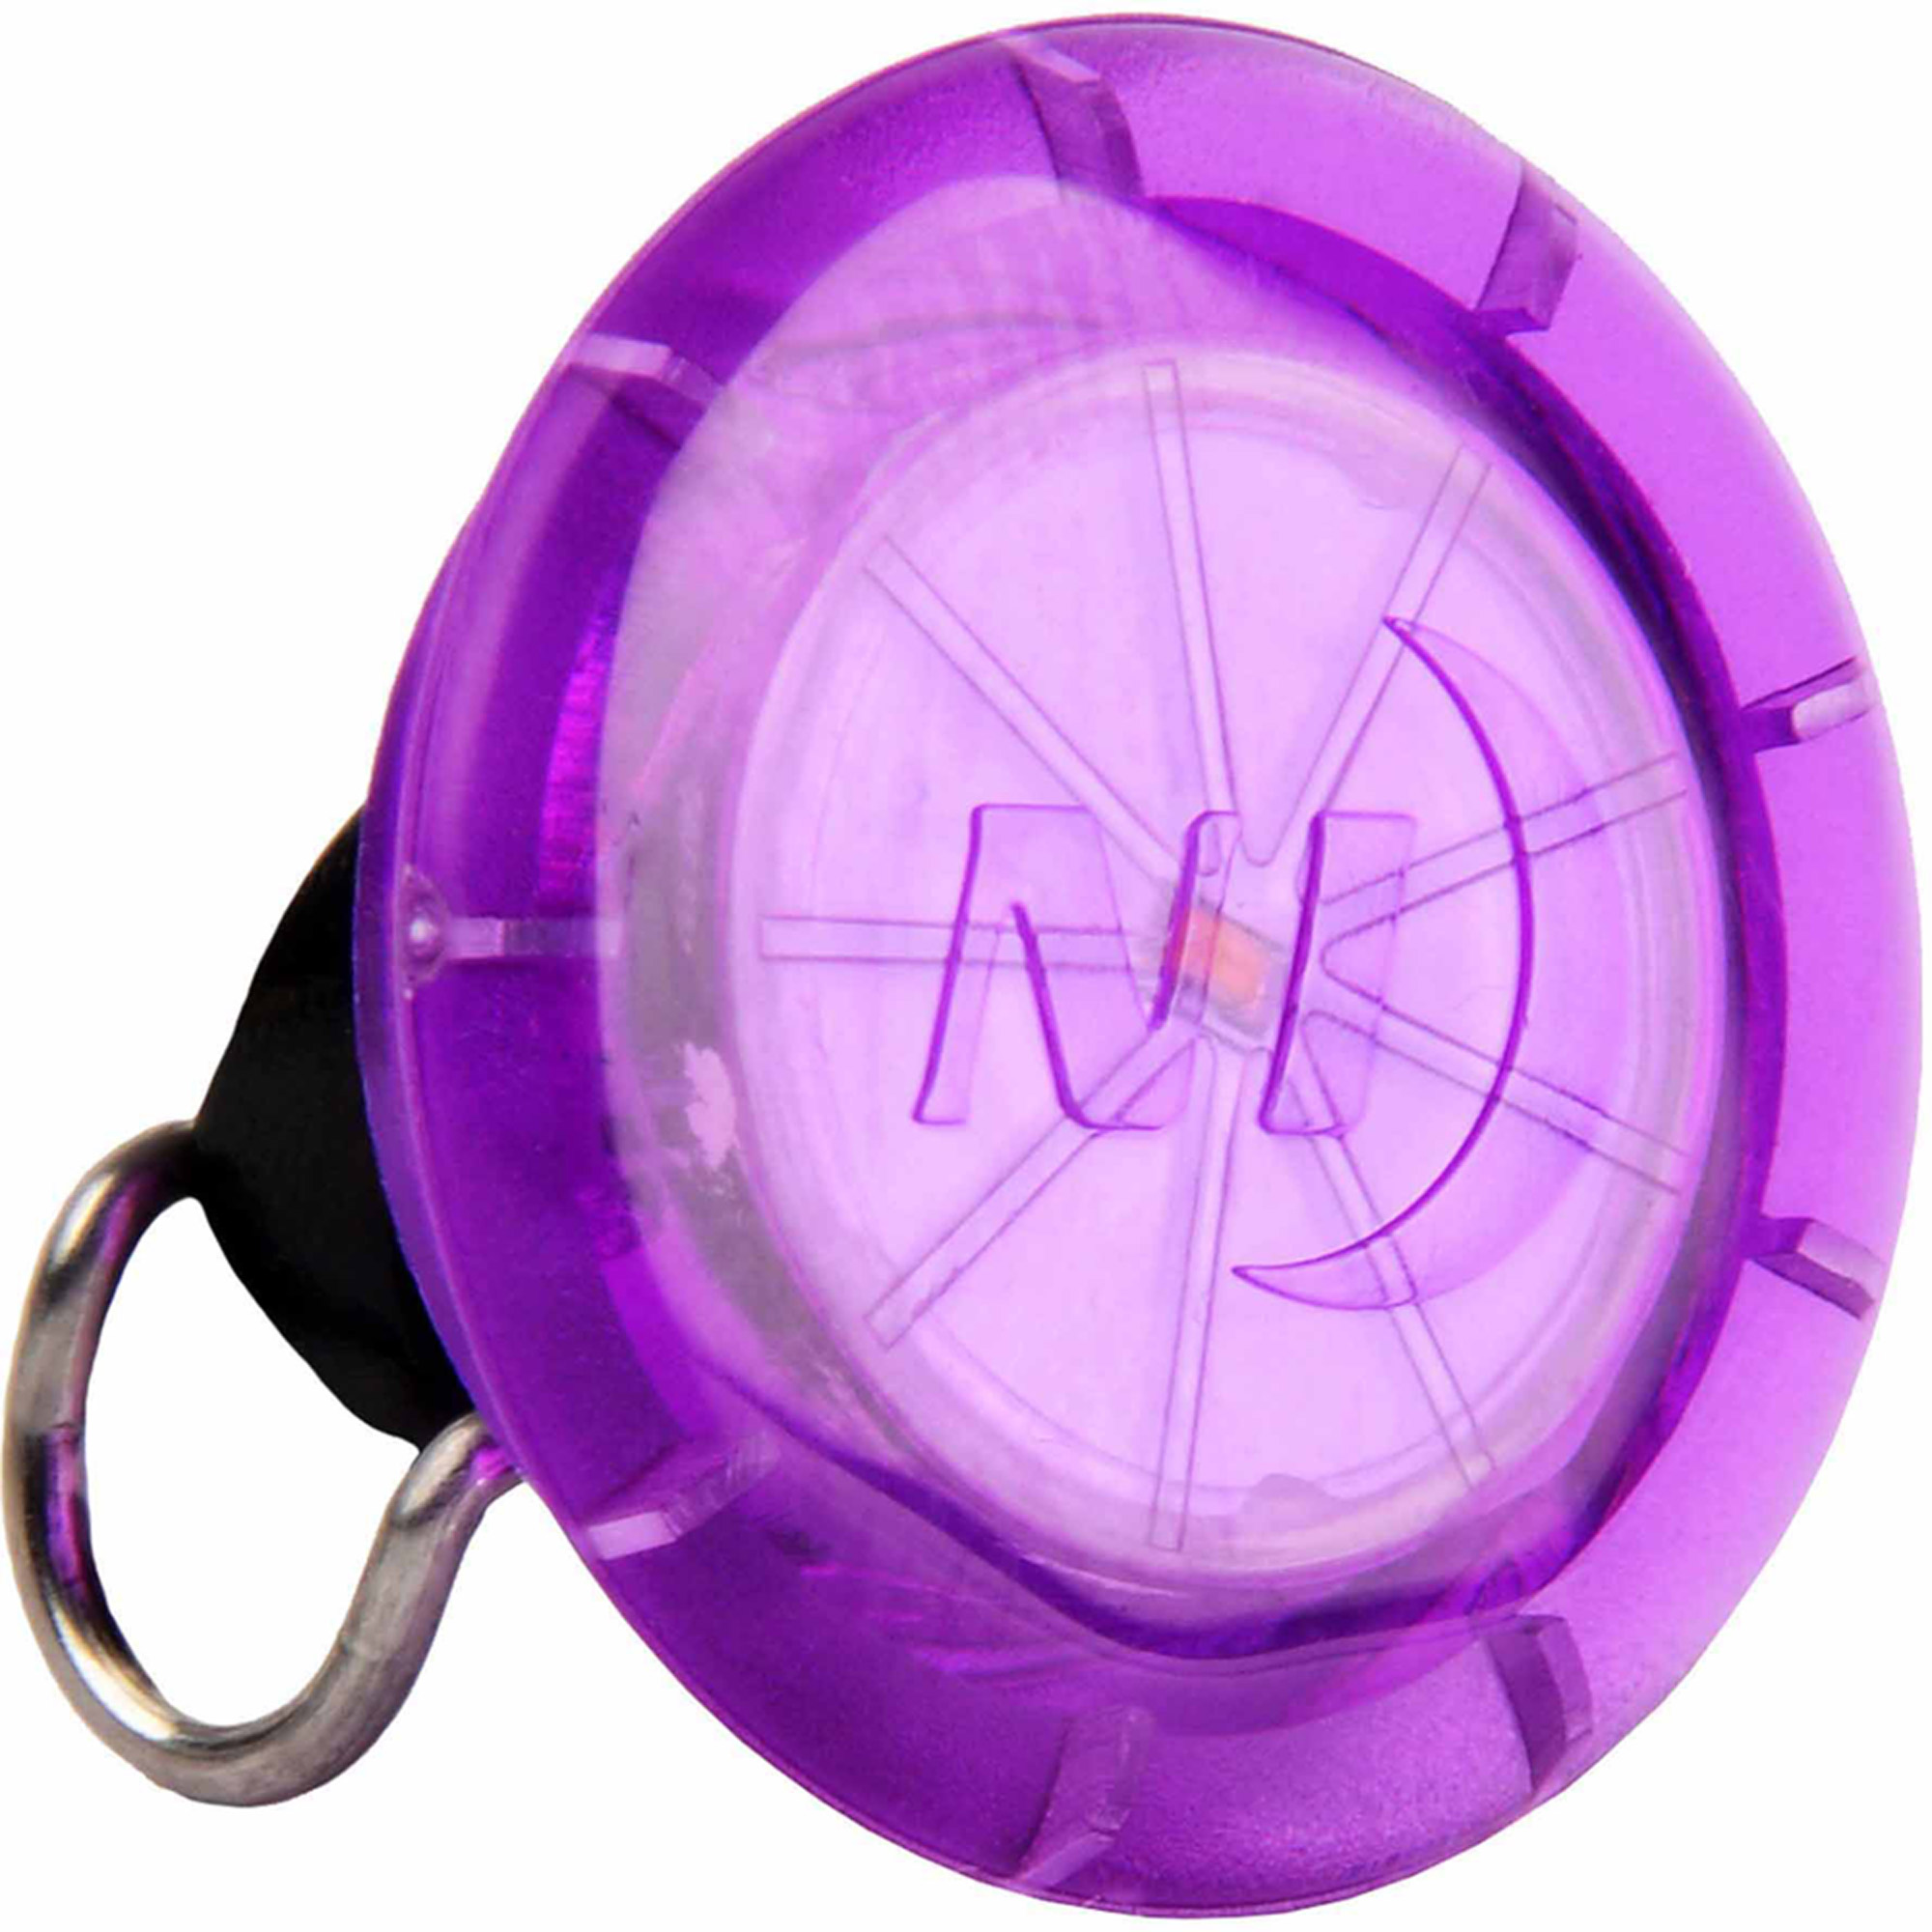 Nite Ize See 'Em LED Spoke Light, 2 Pack